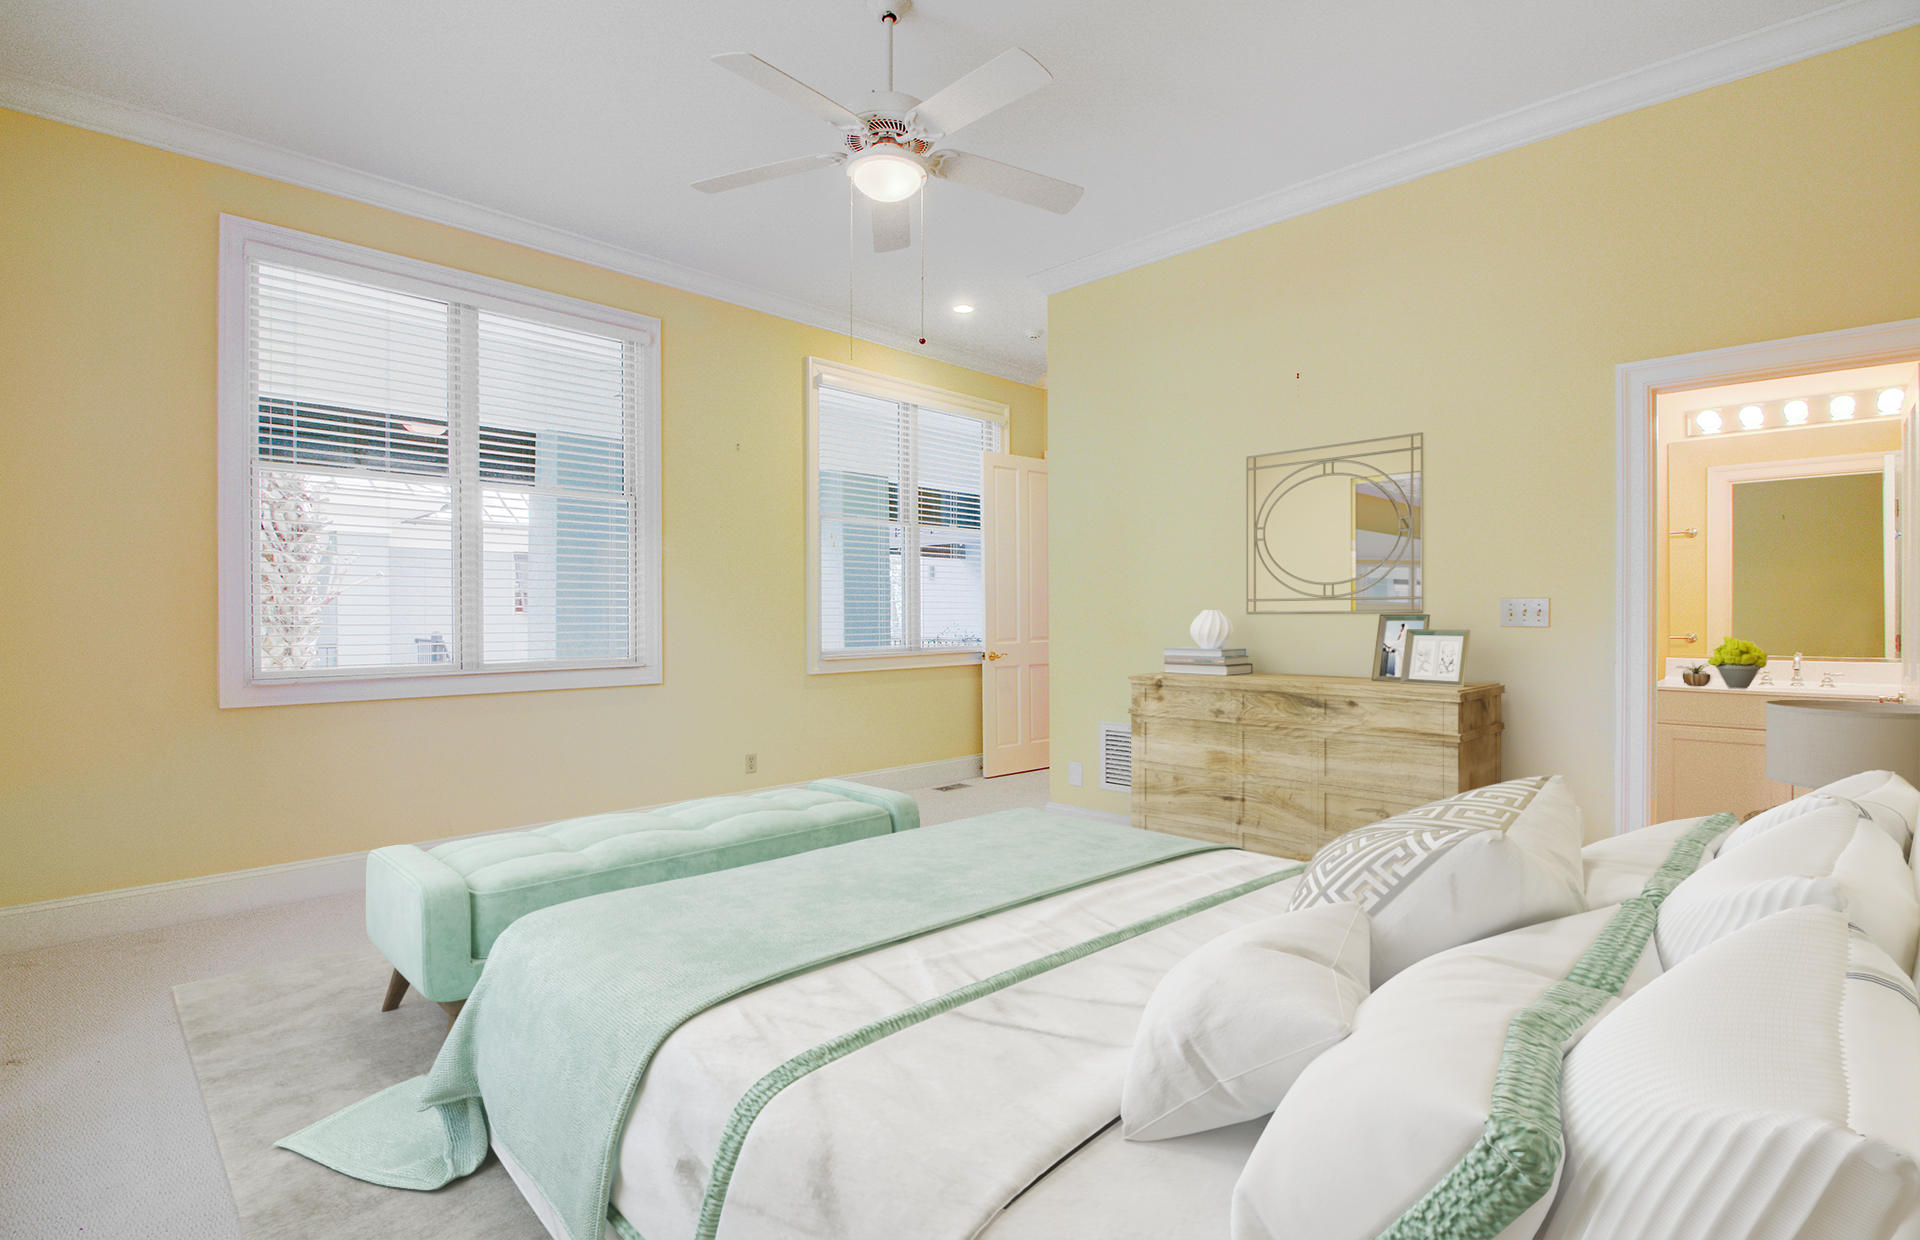 Kiawah Island Homes For Sale - 402 Ocean Oaks, Kiawah Island, SC - 36